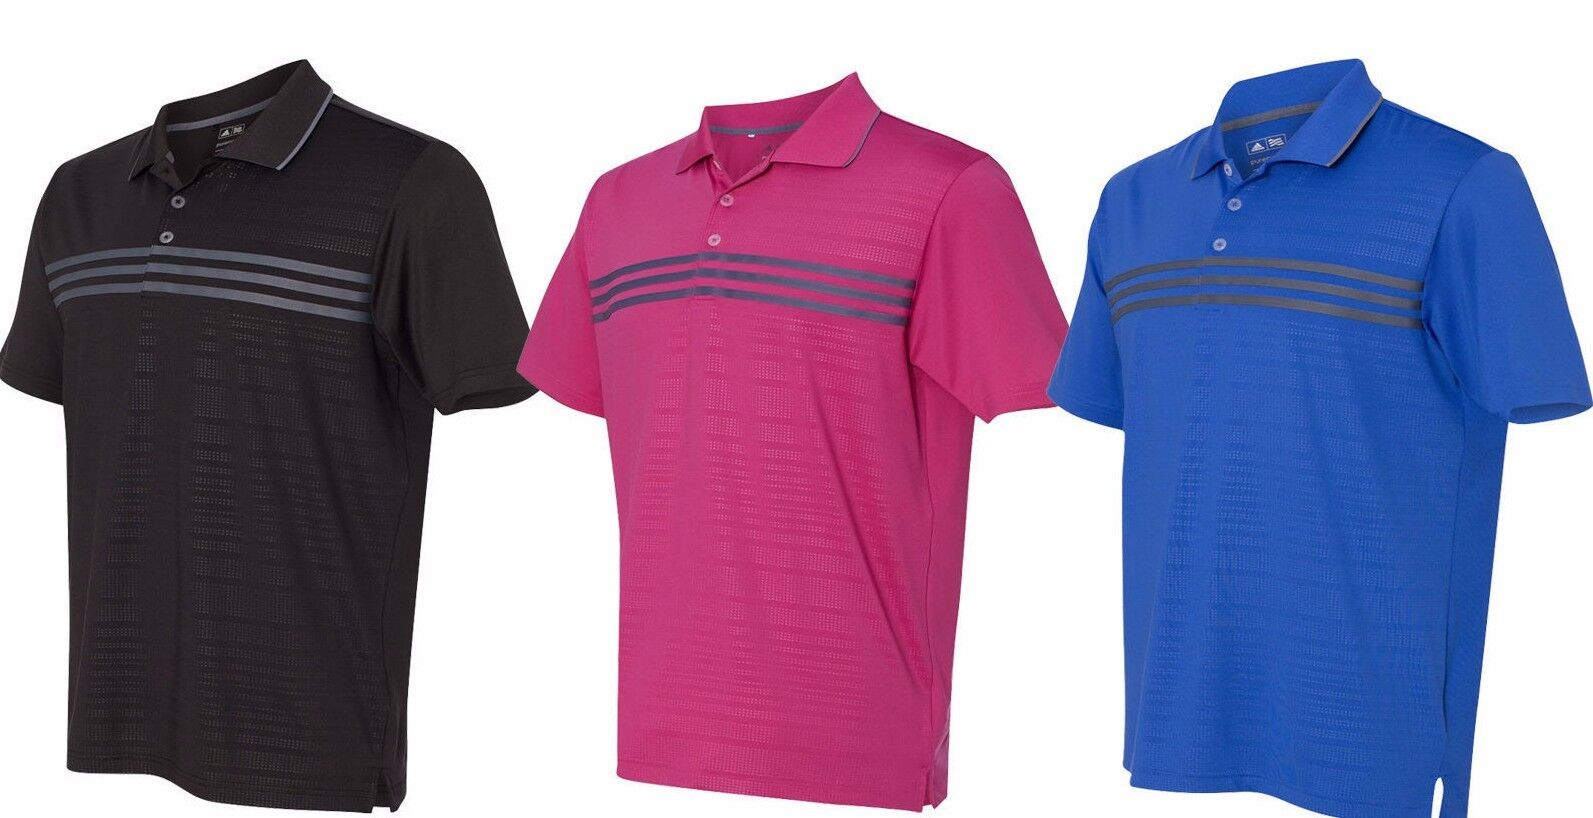 fcdcf480c2ec5 Details about ADIDAS GOLF - Puremotion Polo, Mens S-3XL, Three Stripes  Climalite Sport Shirt